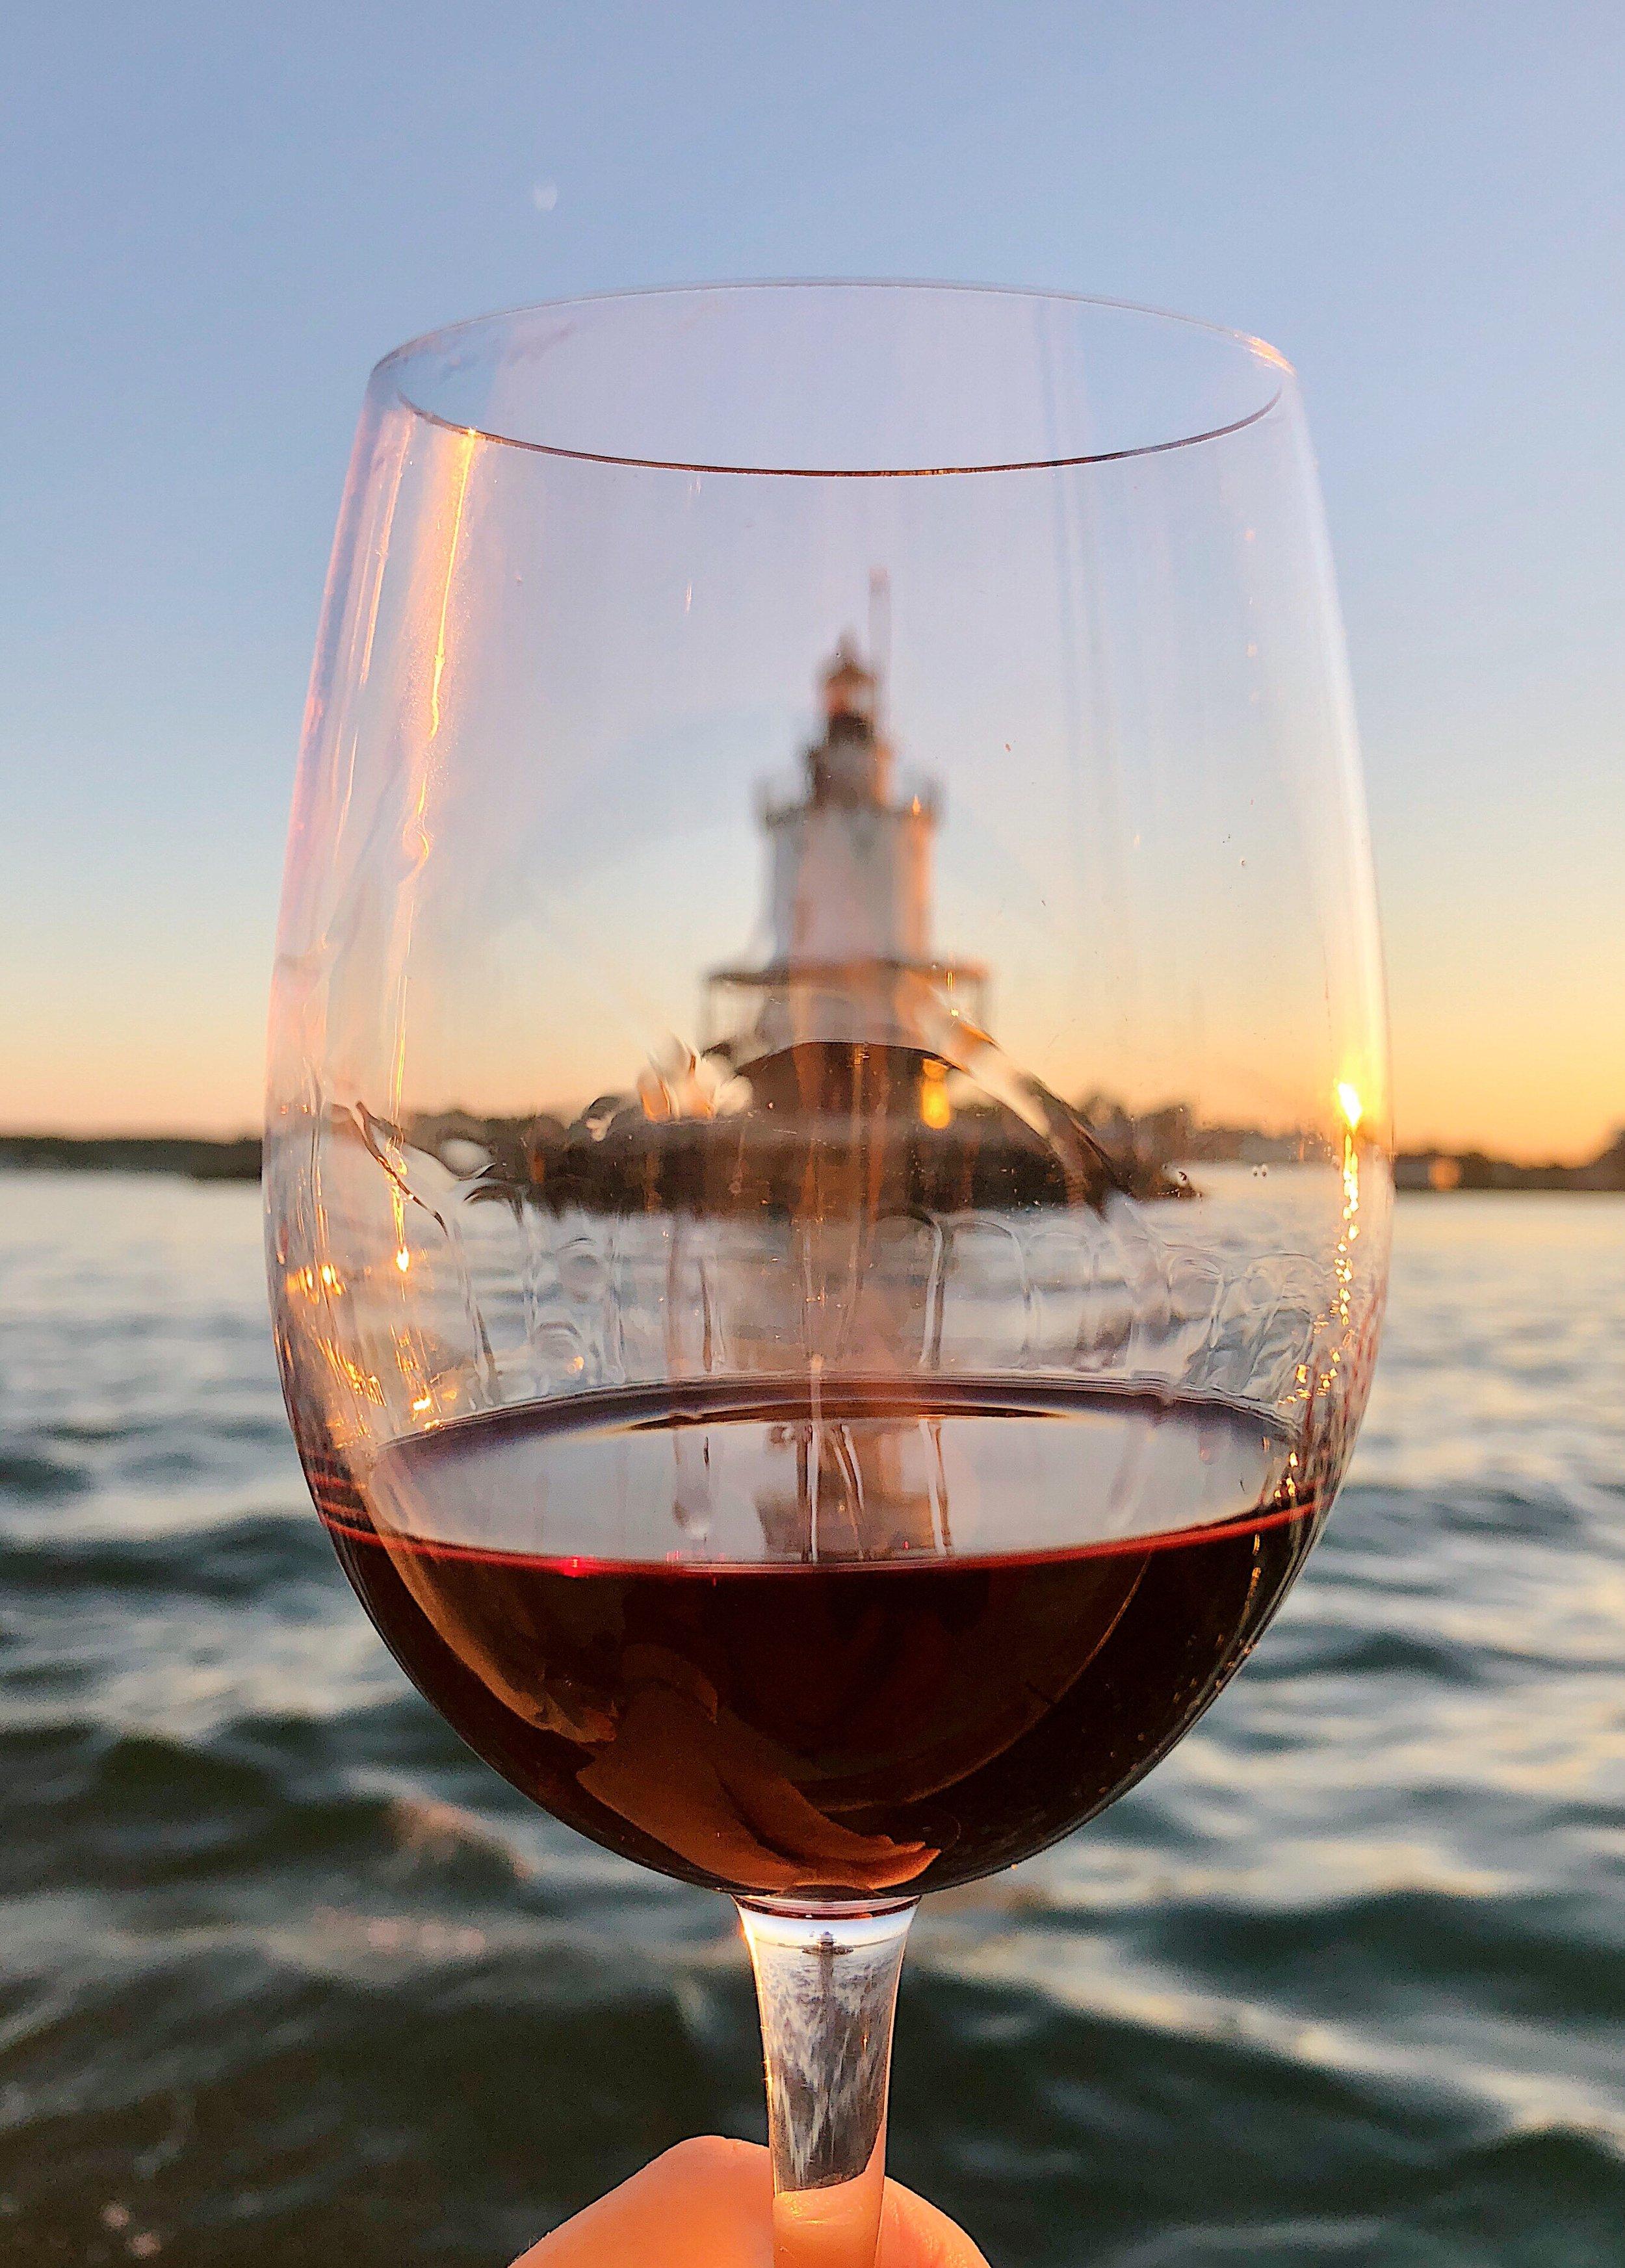 0df3769525 wine_wise_events_portland_maine_wine_sailwine_wise_events_portland_maine_wine_sailwine_sail_winewise_portlandmaine_lighthouse.jpg